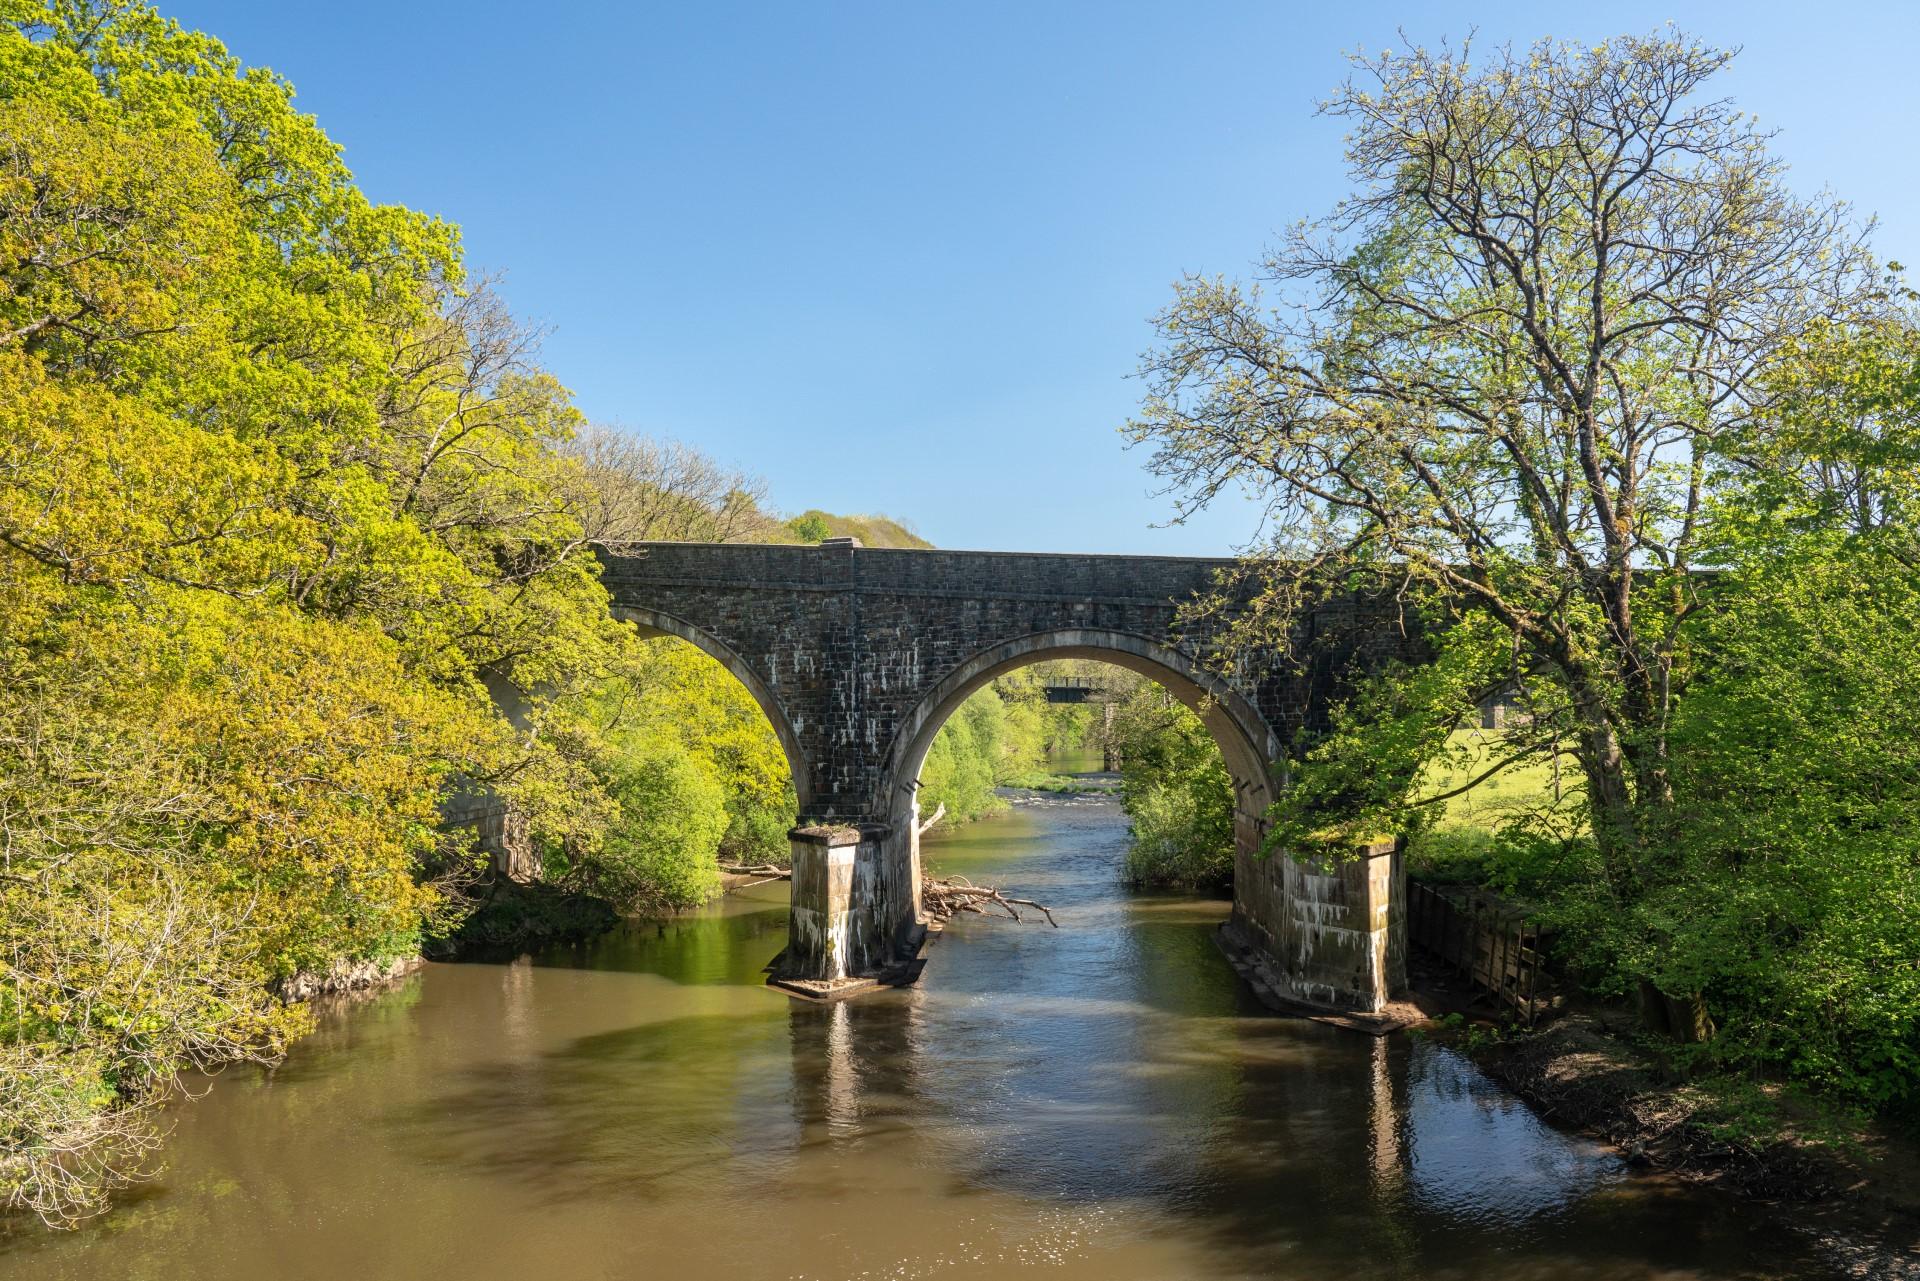 Bridge over River Torridge near Torrington holiday cottages